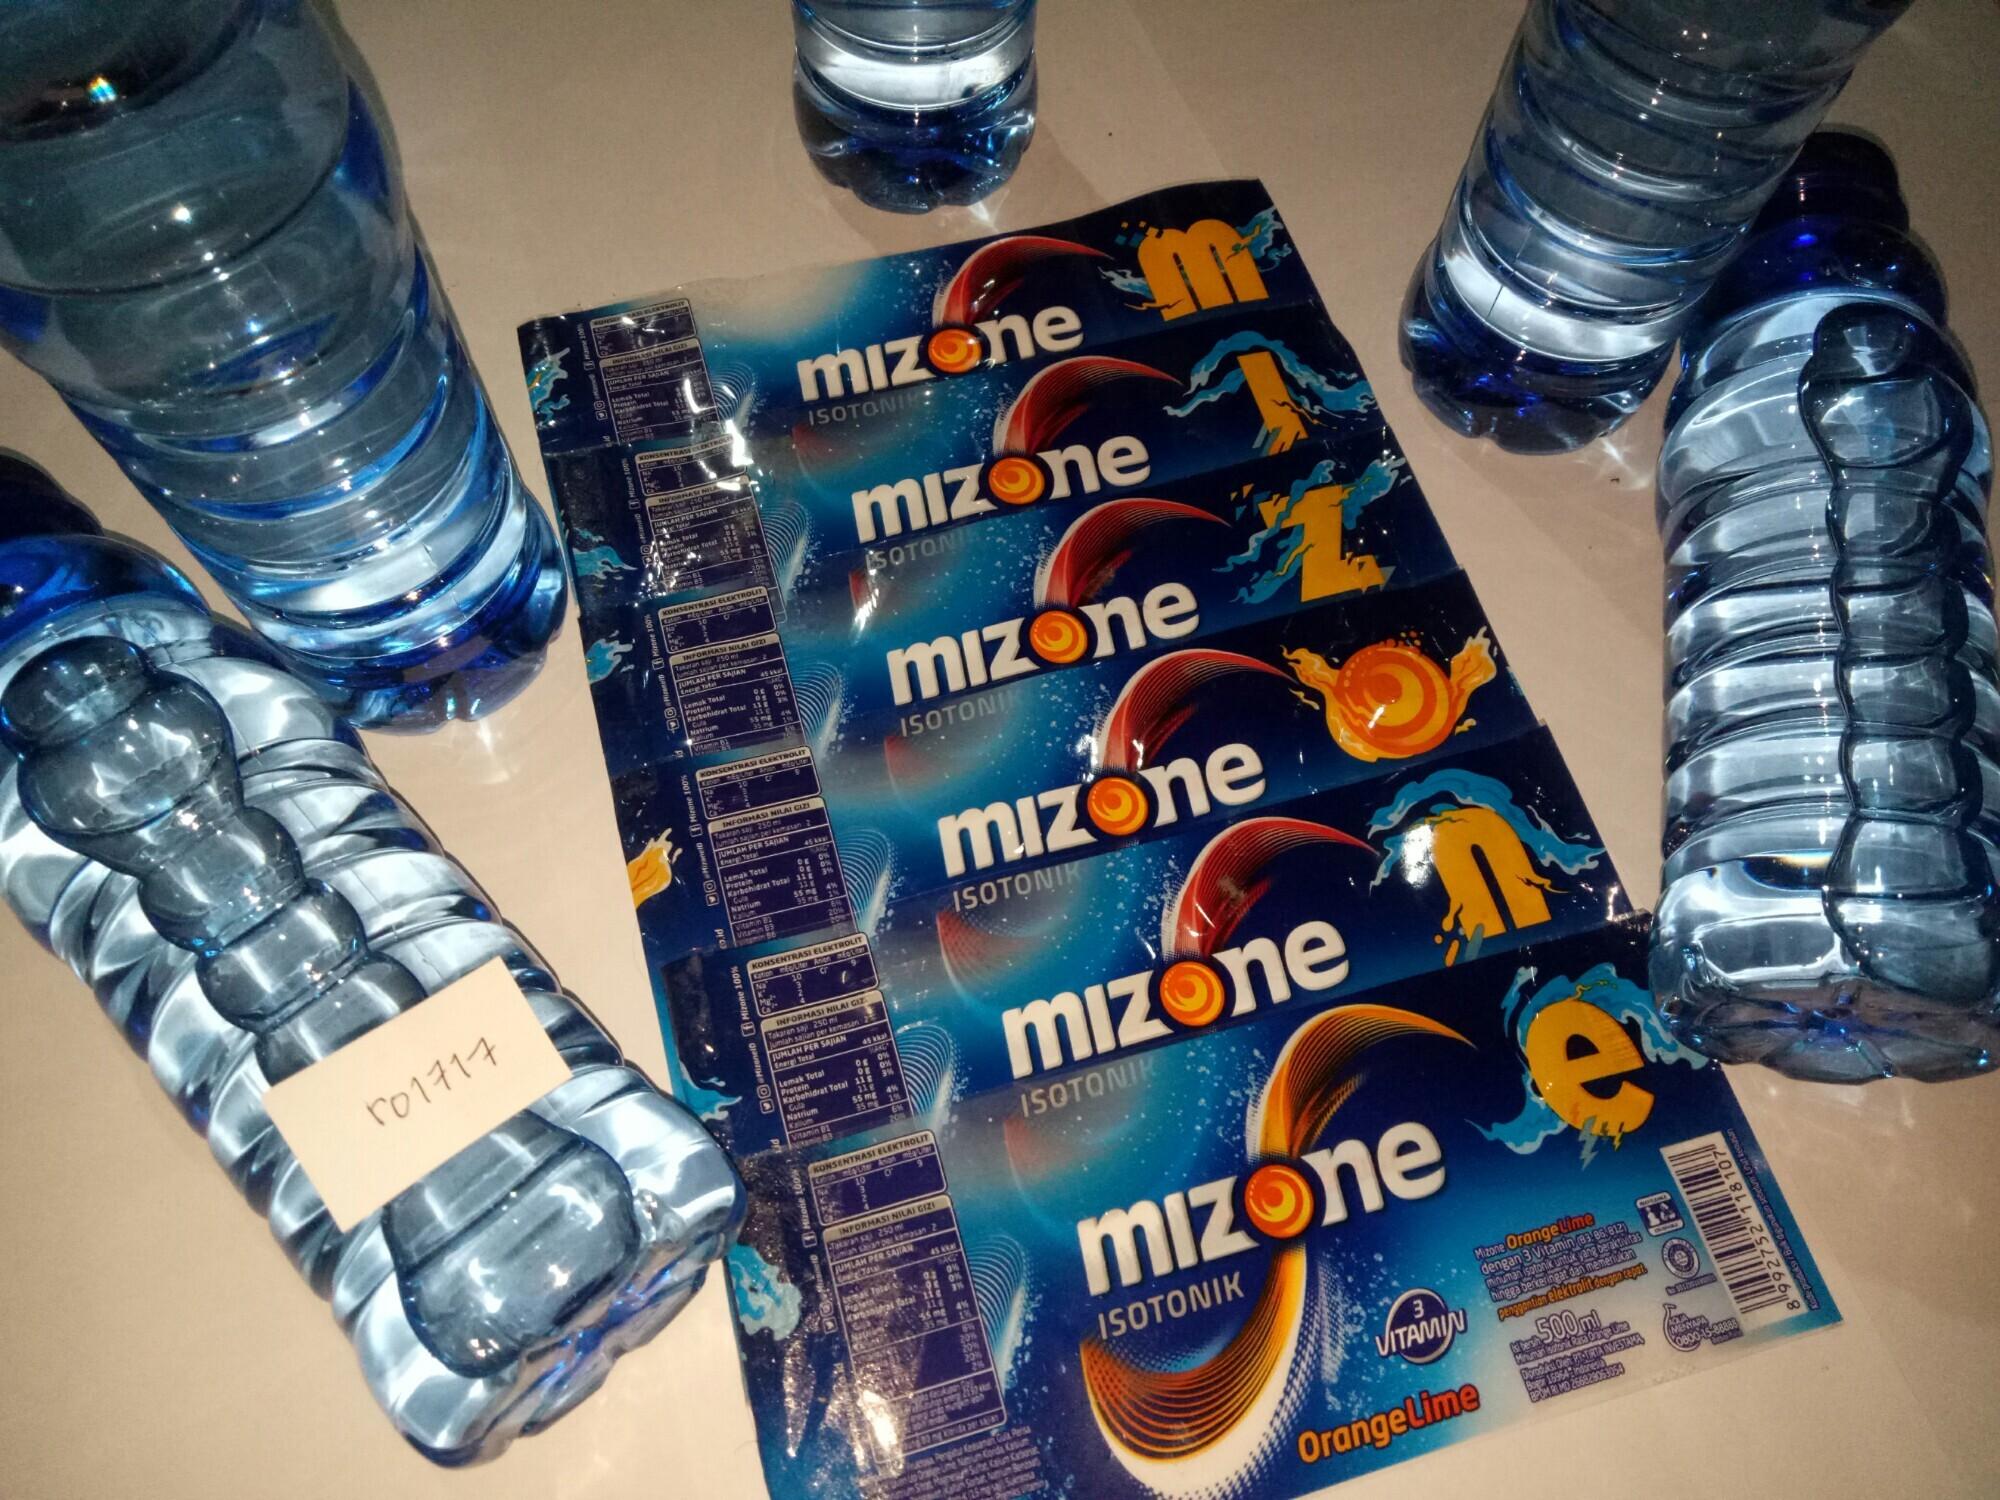 #KASKUSxMizone Suasana Makin Akrab dengan Mizone